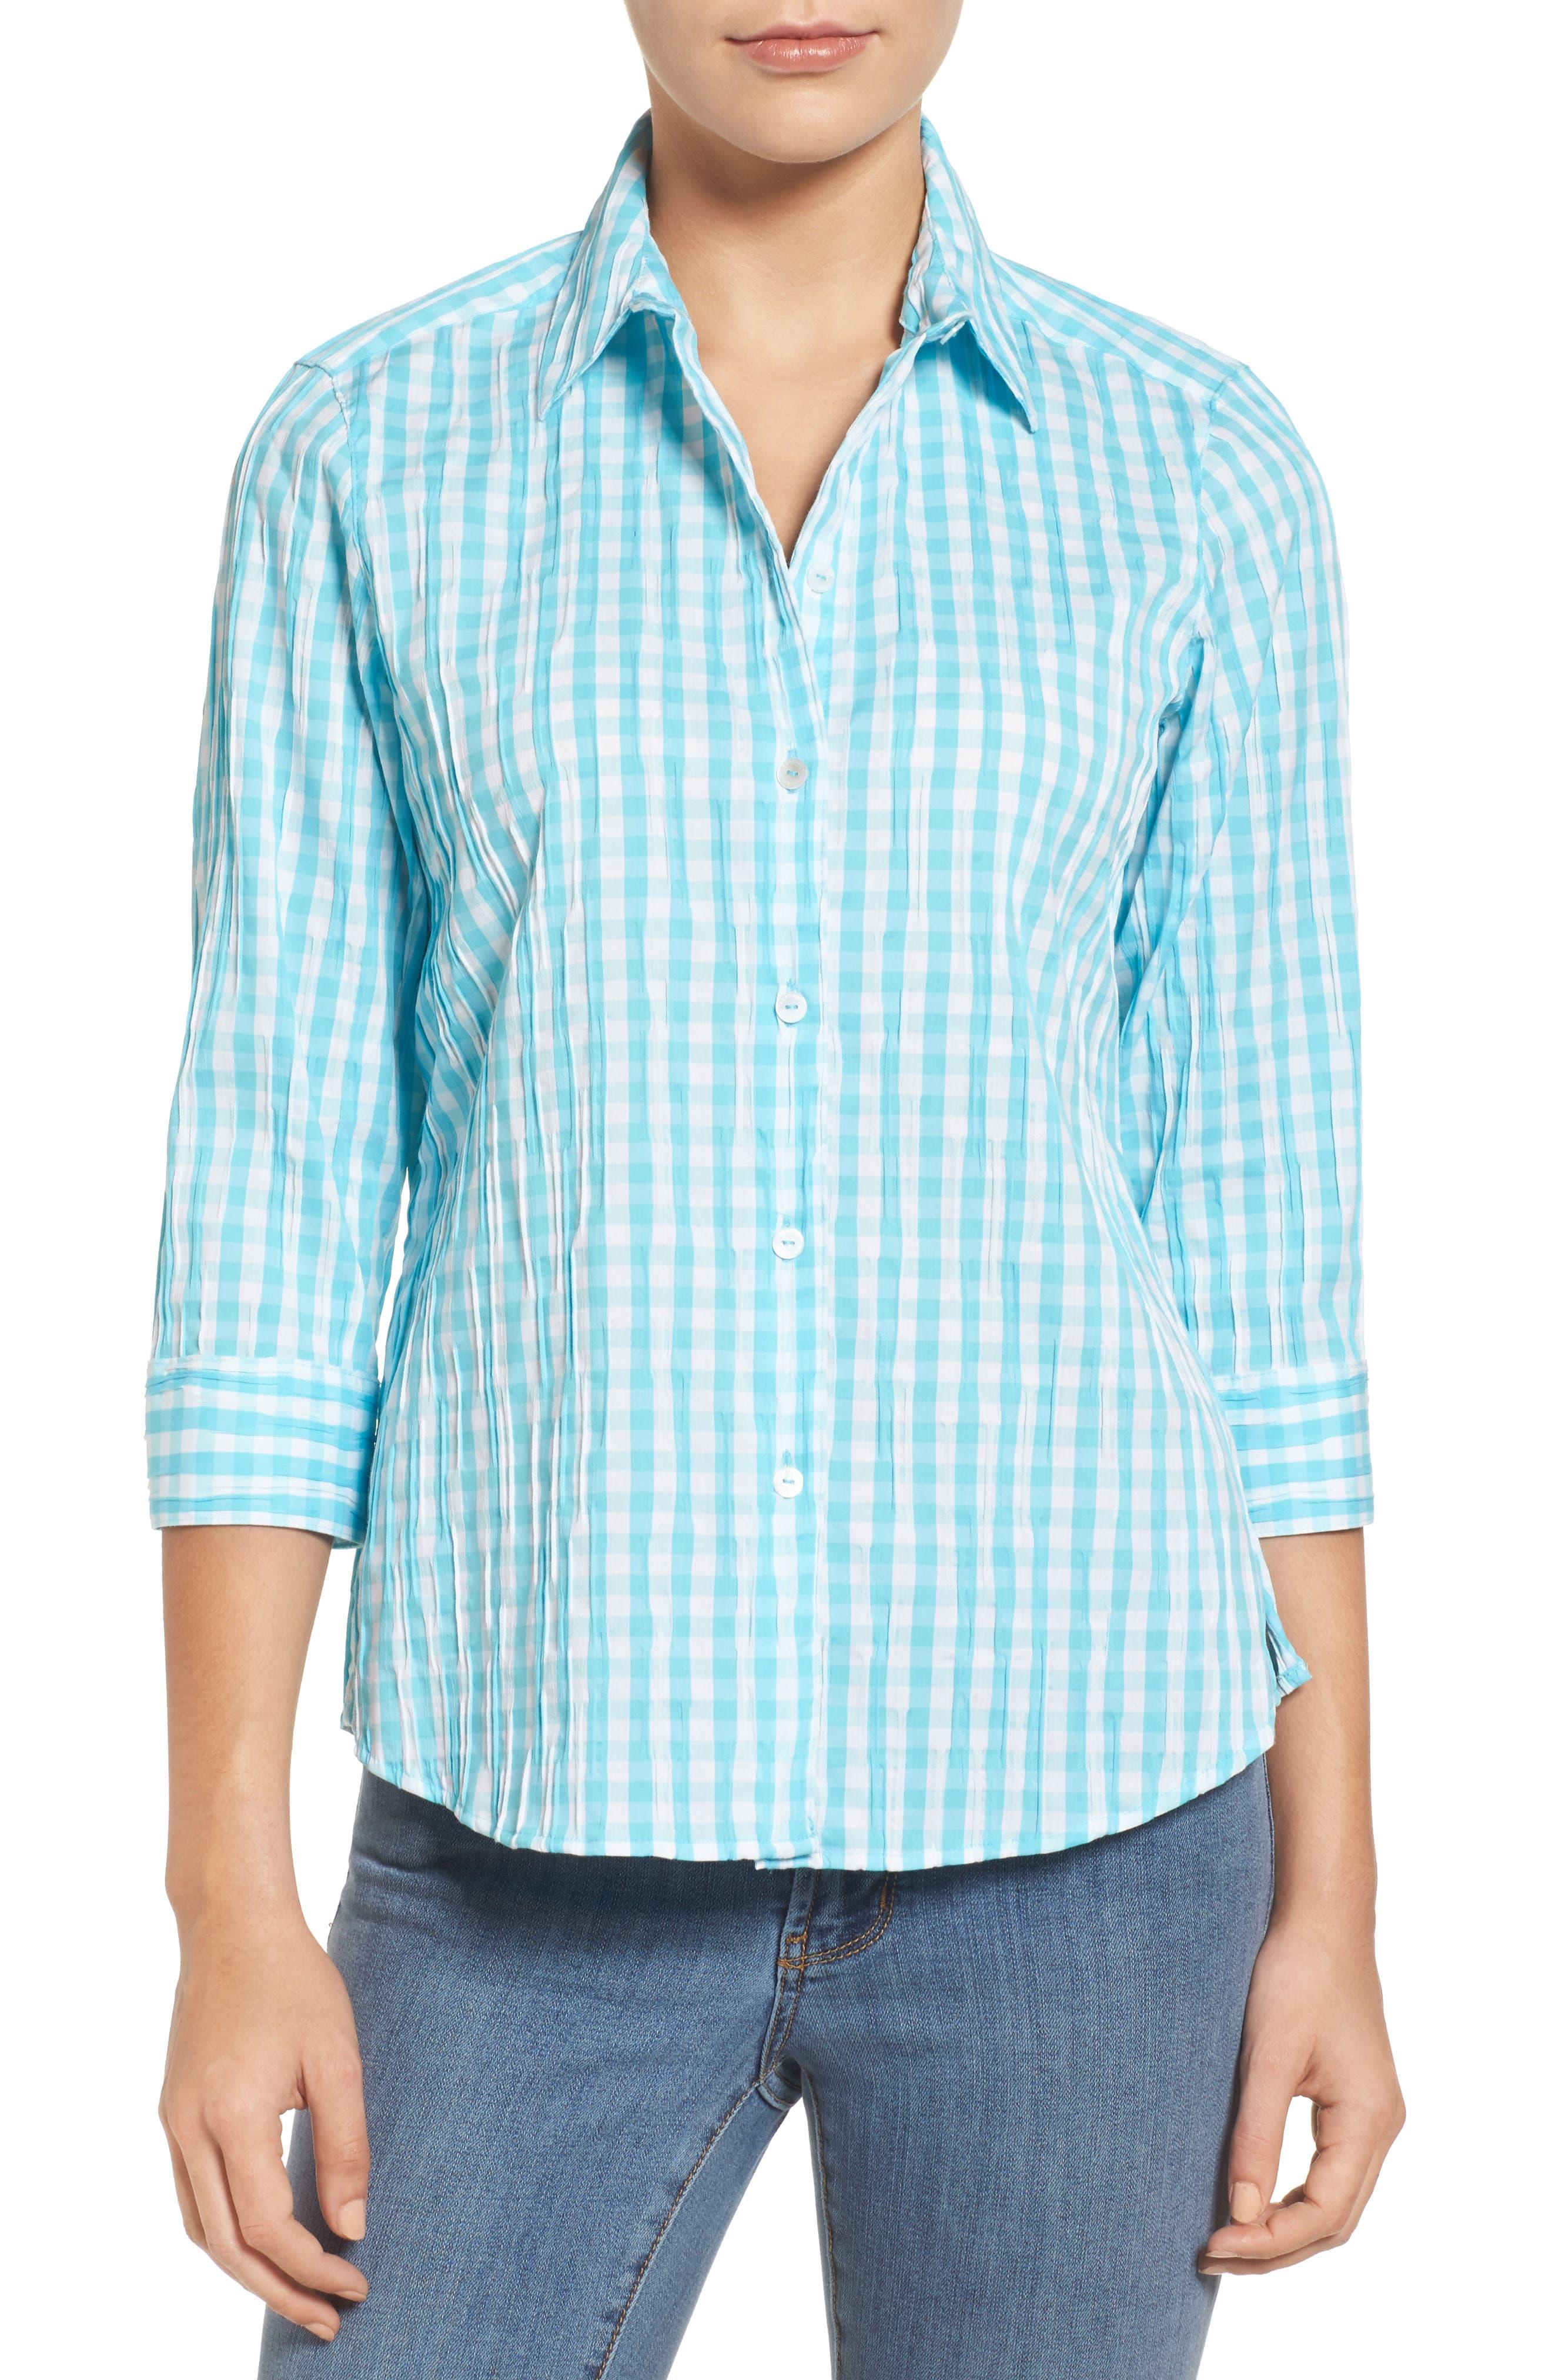 Main Image - Foxcroft Crinkled Gingham Shirt (Regular & Petite)